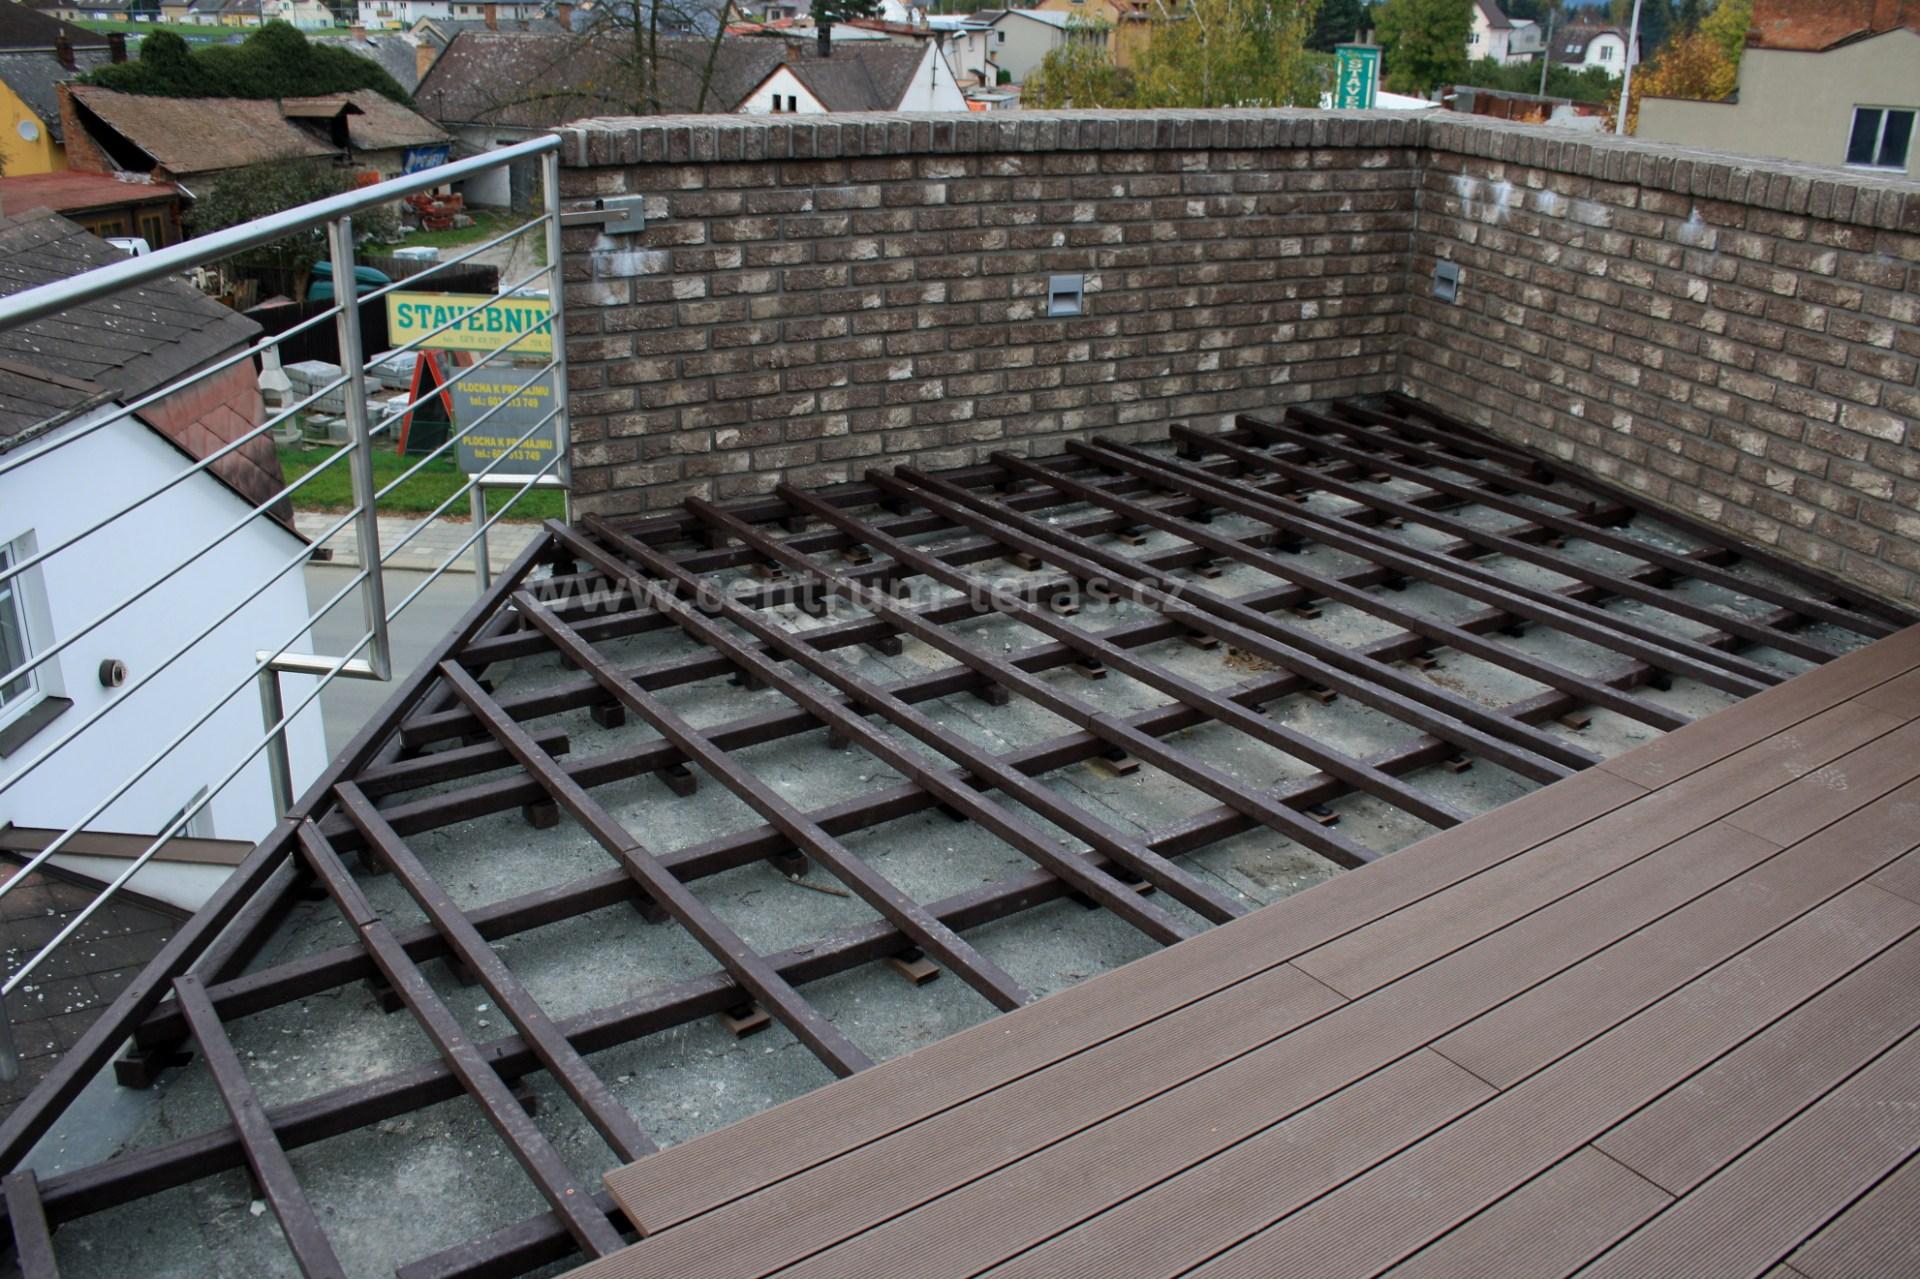 terasove-terce-pod-dlazbu-na-balkony-lodzie-terasy-mola-vystavni-plochy-montaz-cena-_1